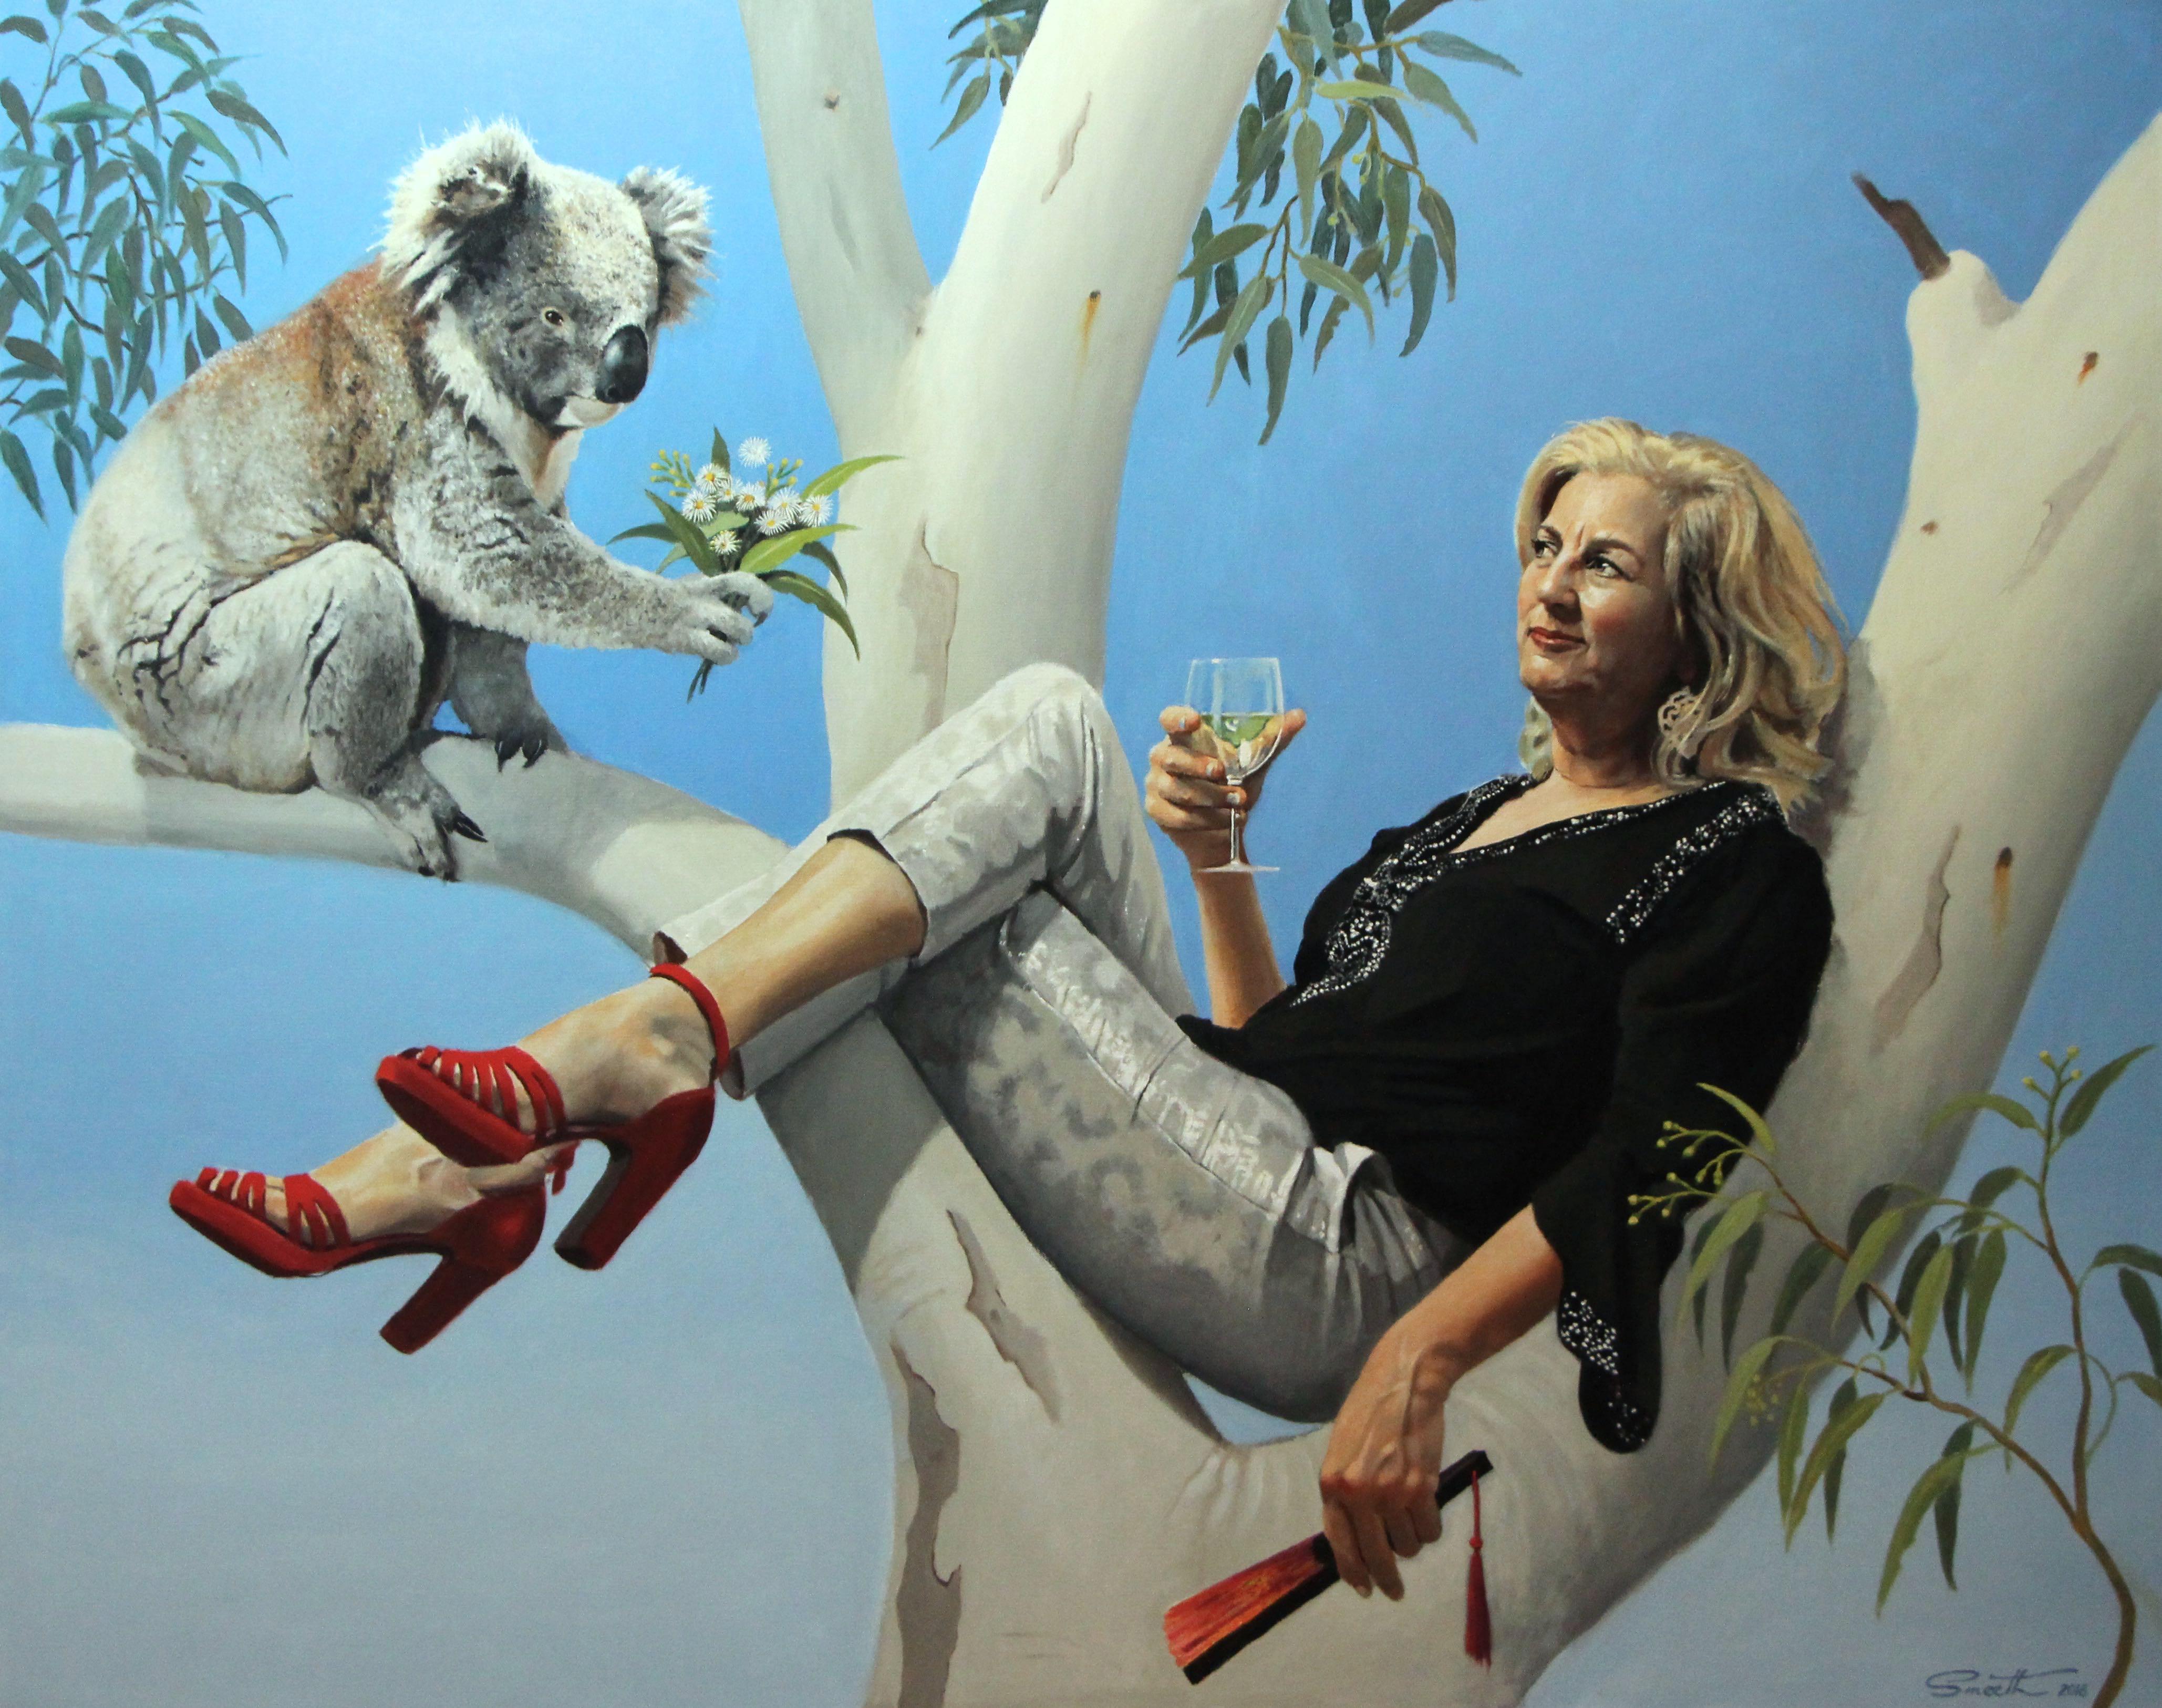 21-You're still hot to me- - A Portrait of Jean Kittson 2016 Oil on canvas 120x150cm Salon Des Refuses